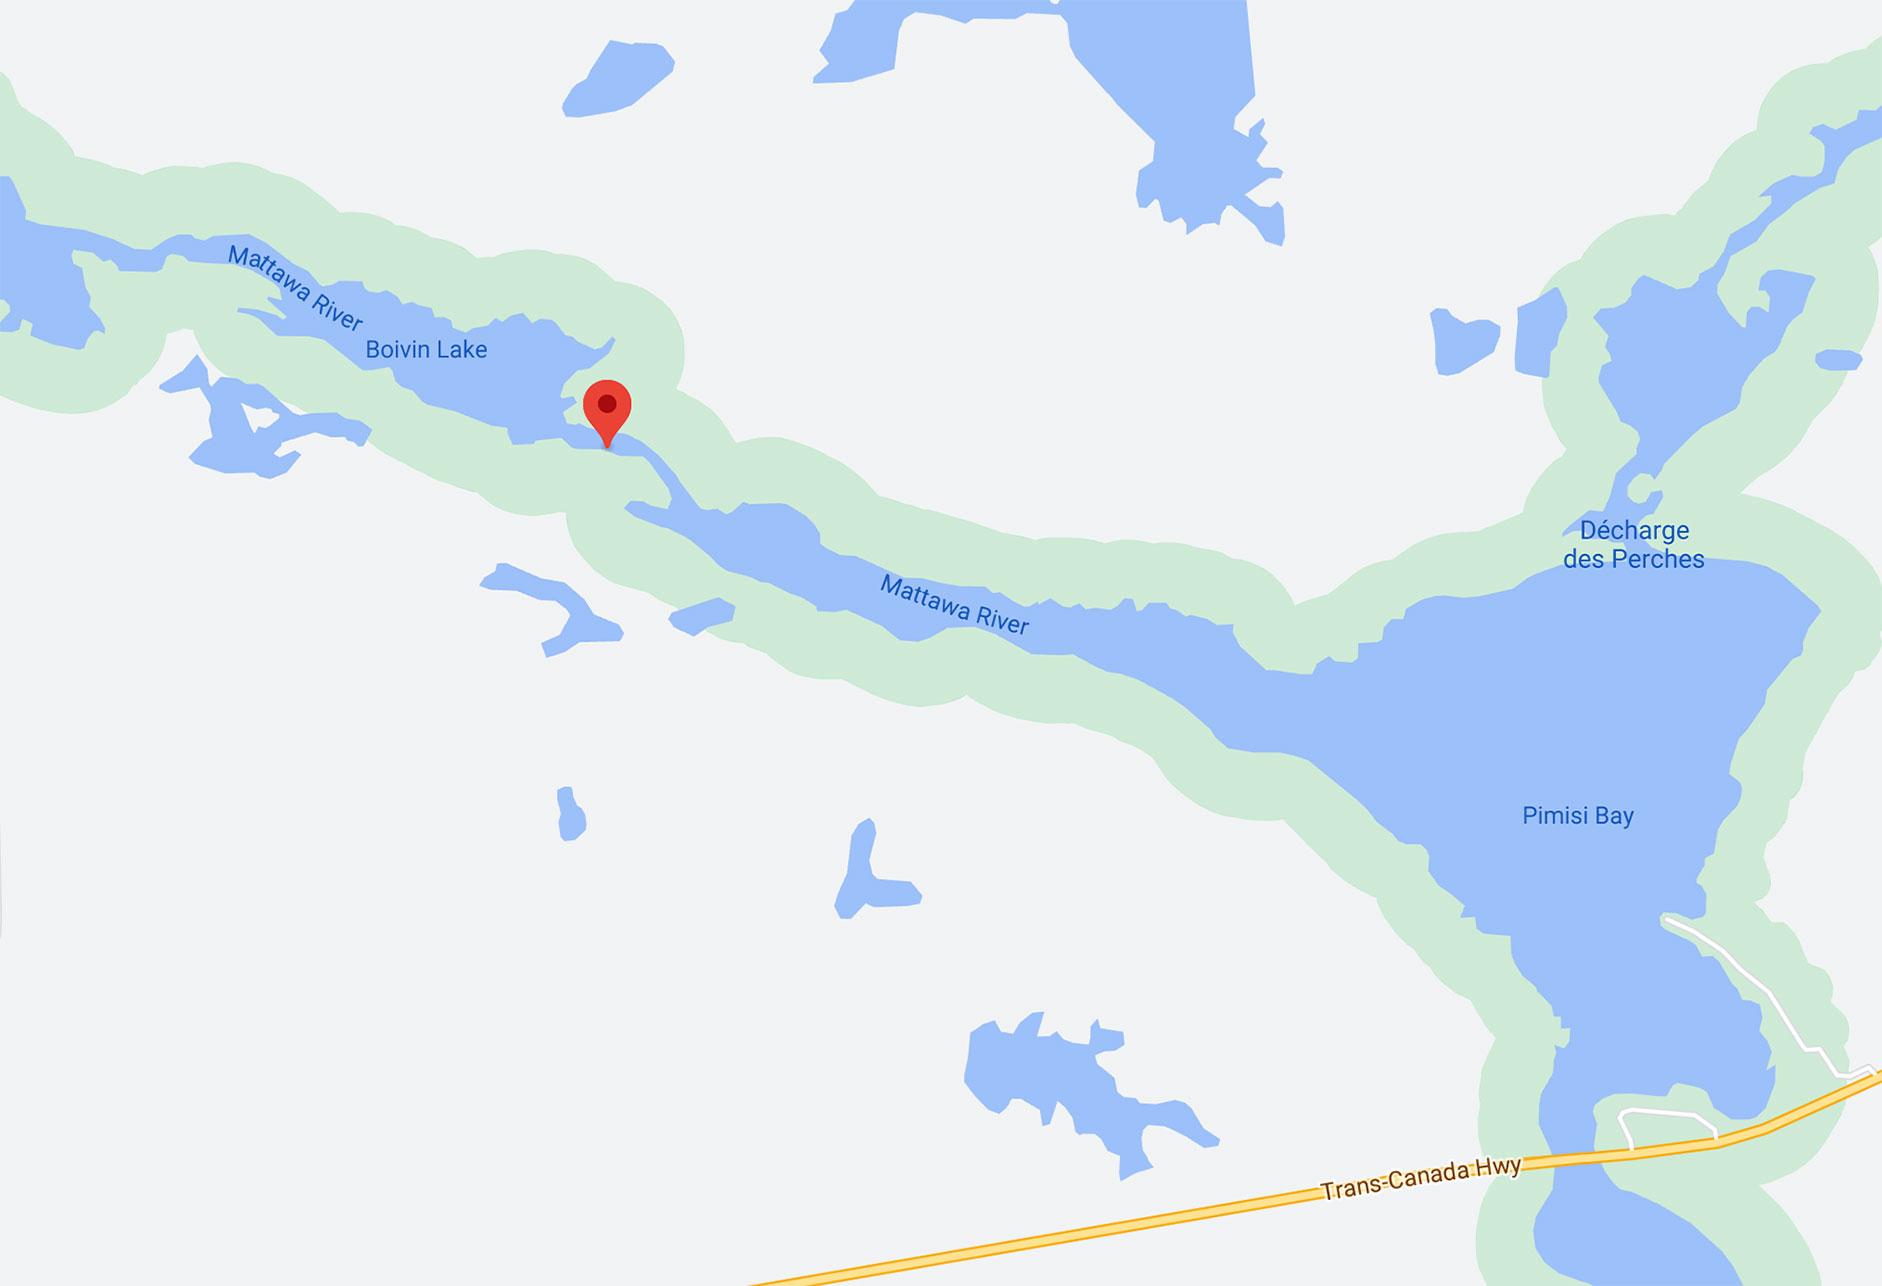 Talon Chutes Dive Site Google Map Location, Scuba Diving Ontario